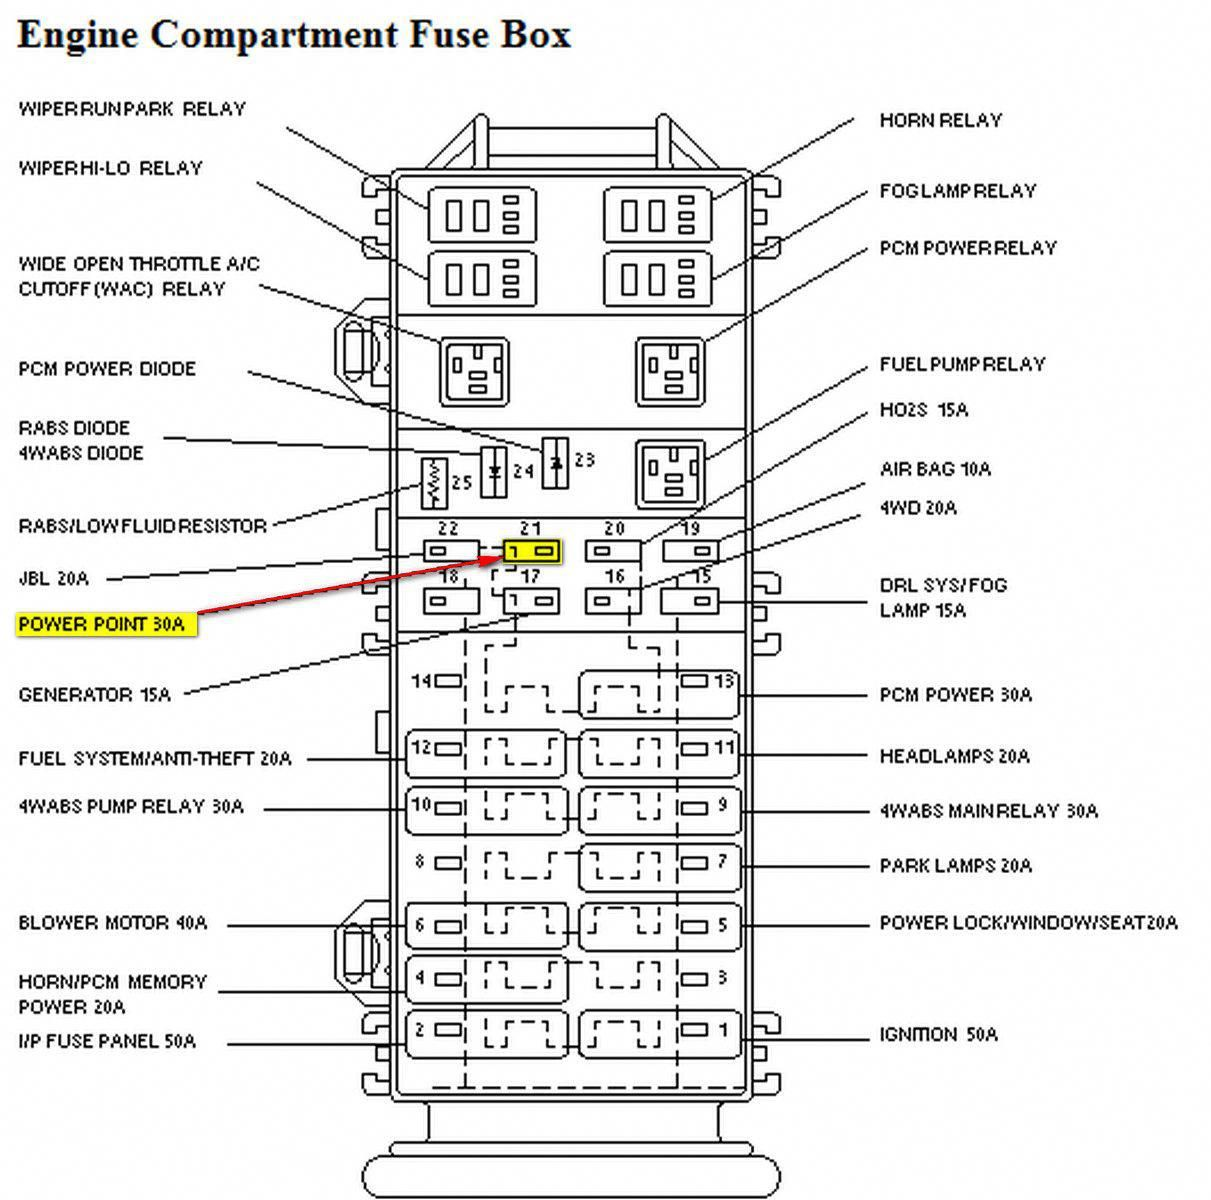 medium resolution of 1997 ford ranger fuse box diagram truck part diagrams 80x30interiordoor